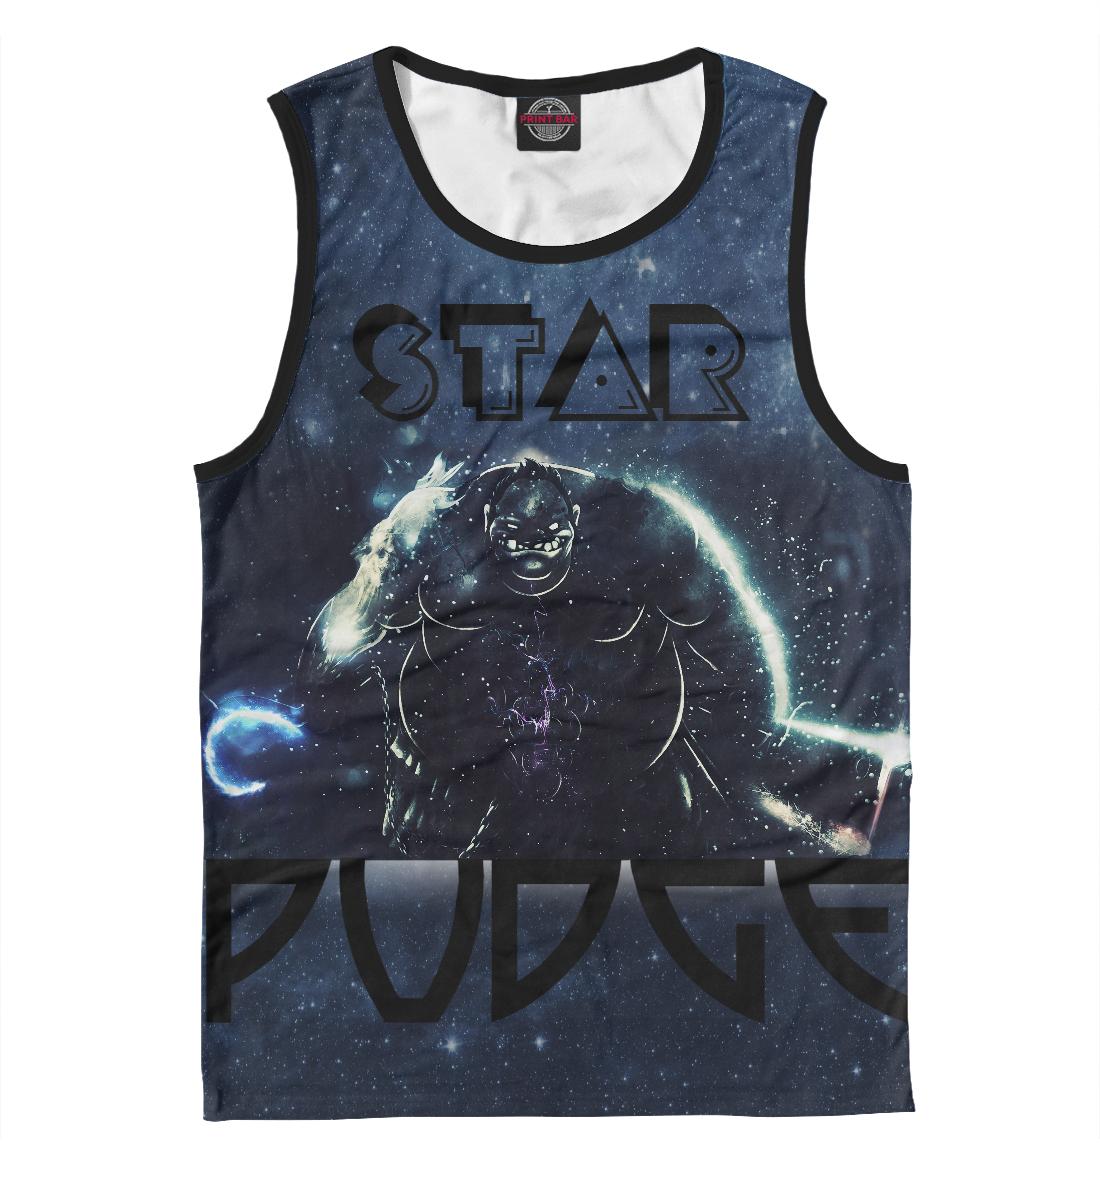 Купить Звёздный Пудж (Star Pudge), Printbar, Майки, DO2-935955-may-2